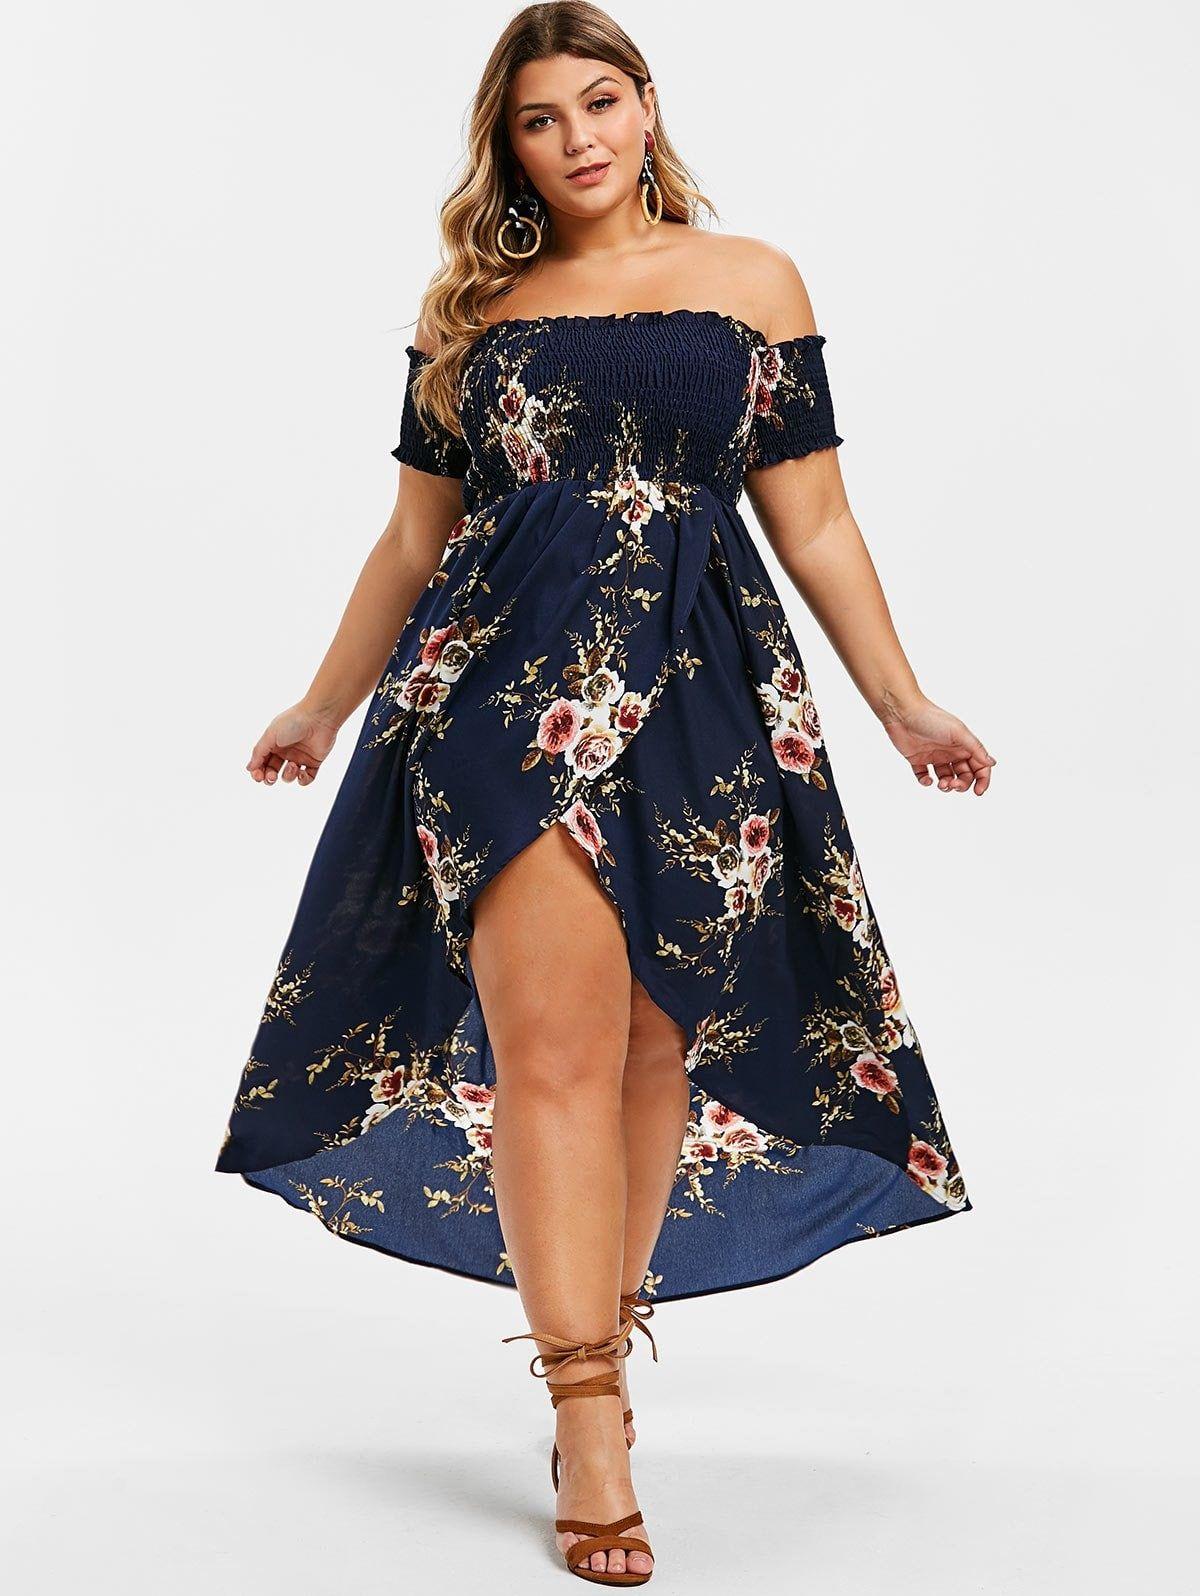 Angie | Floral Smocked Sleeveless Maxi Dress (Plus Size) | HauteLook